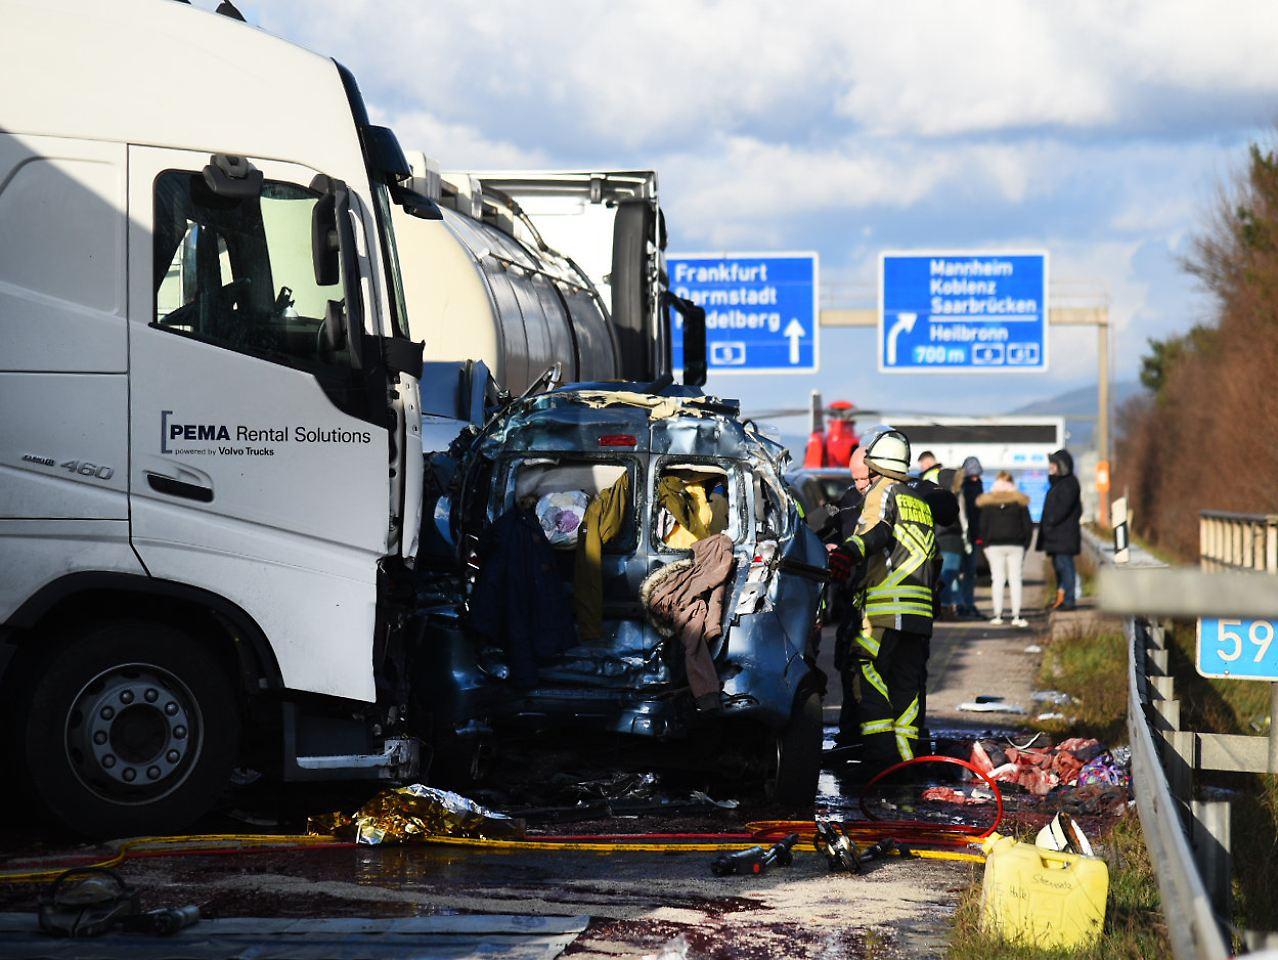 Barcelona Unfall Heute